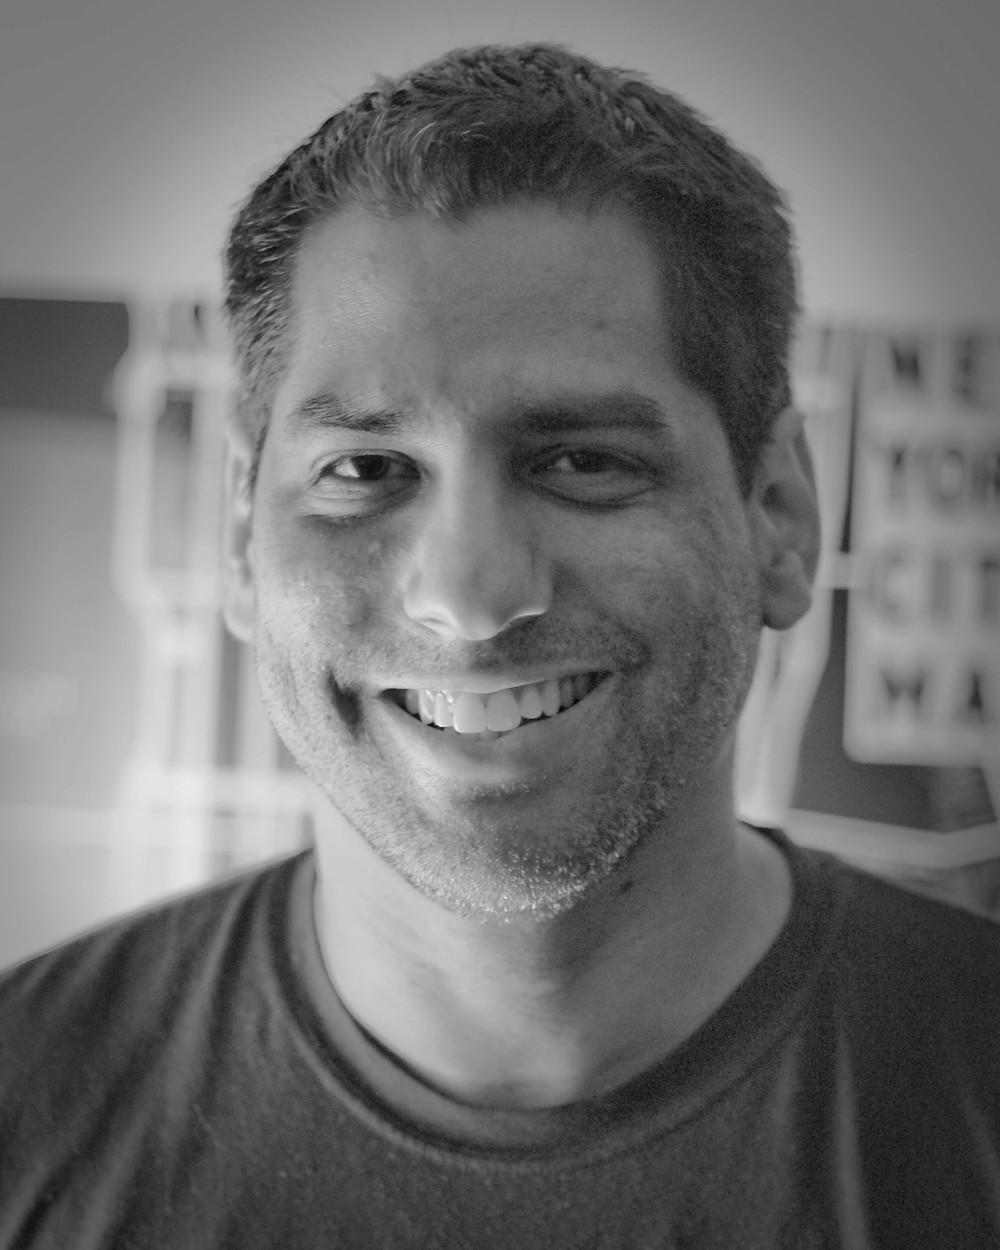 Producer Luis Eduardo Villamizar